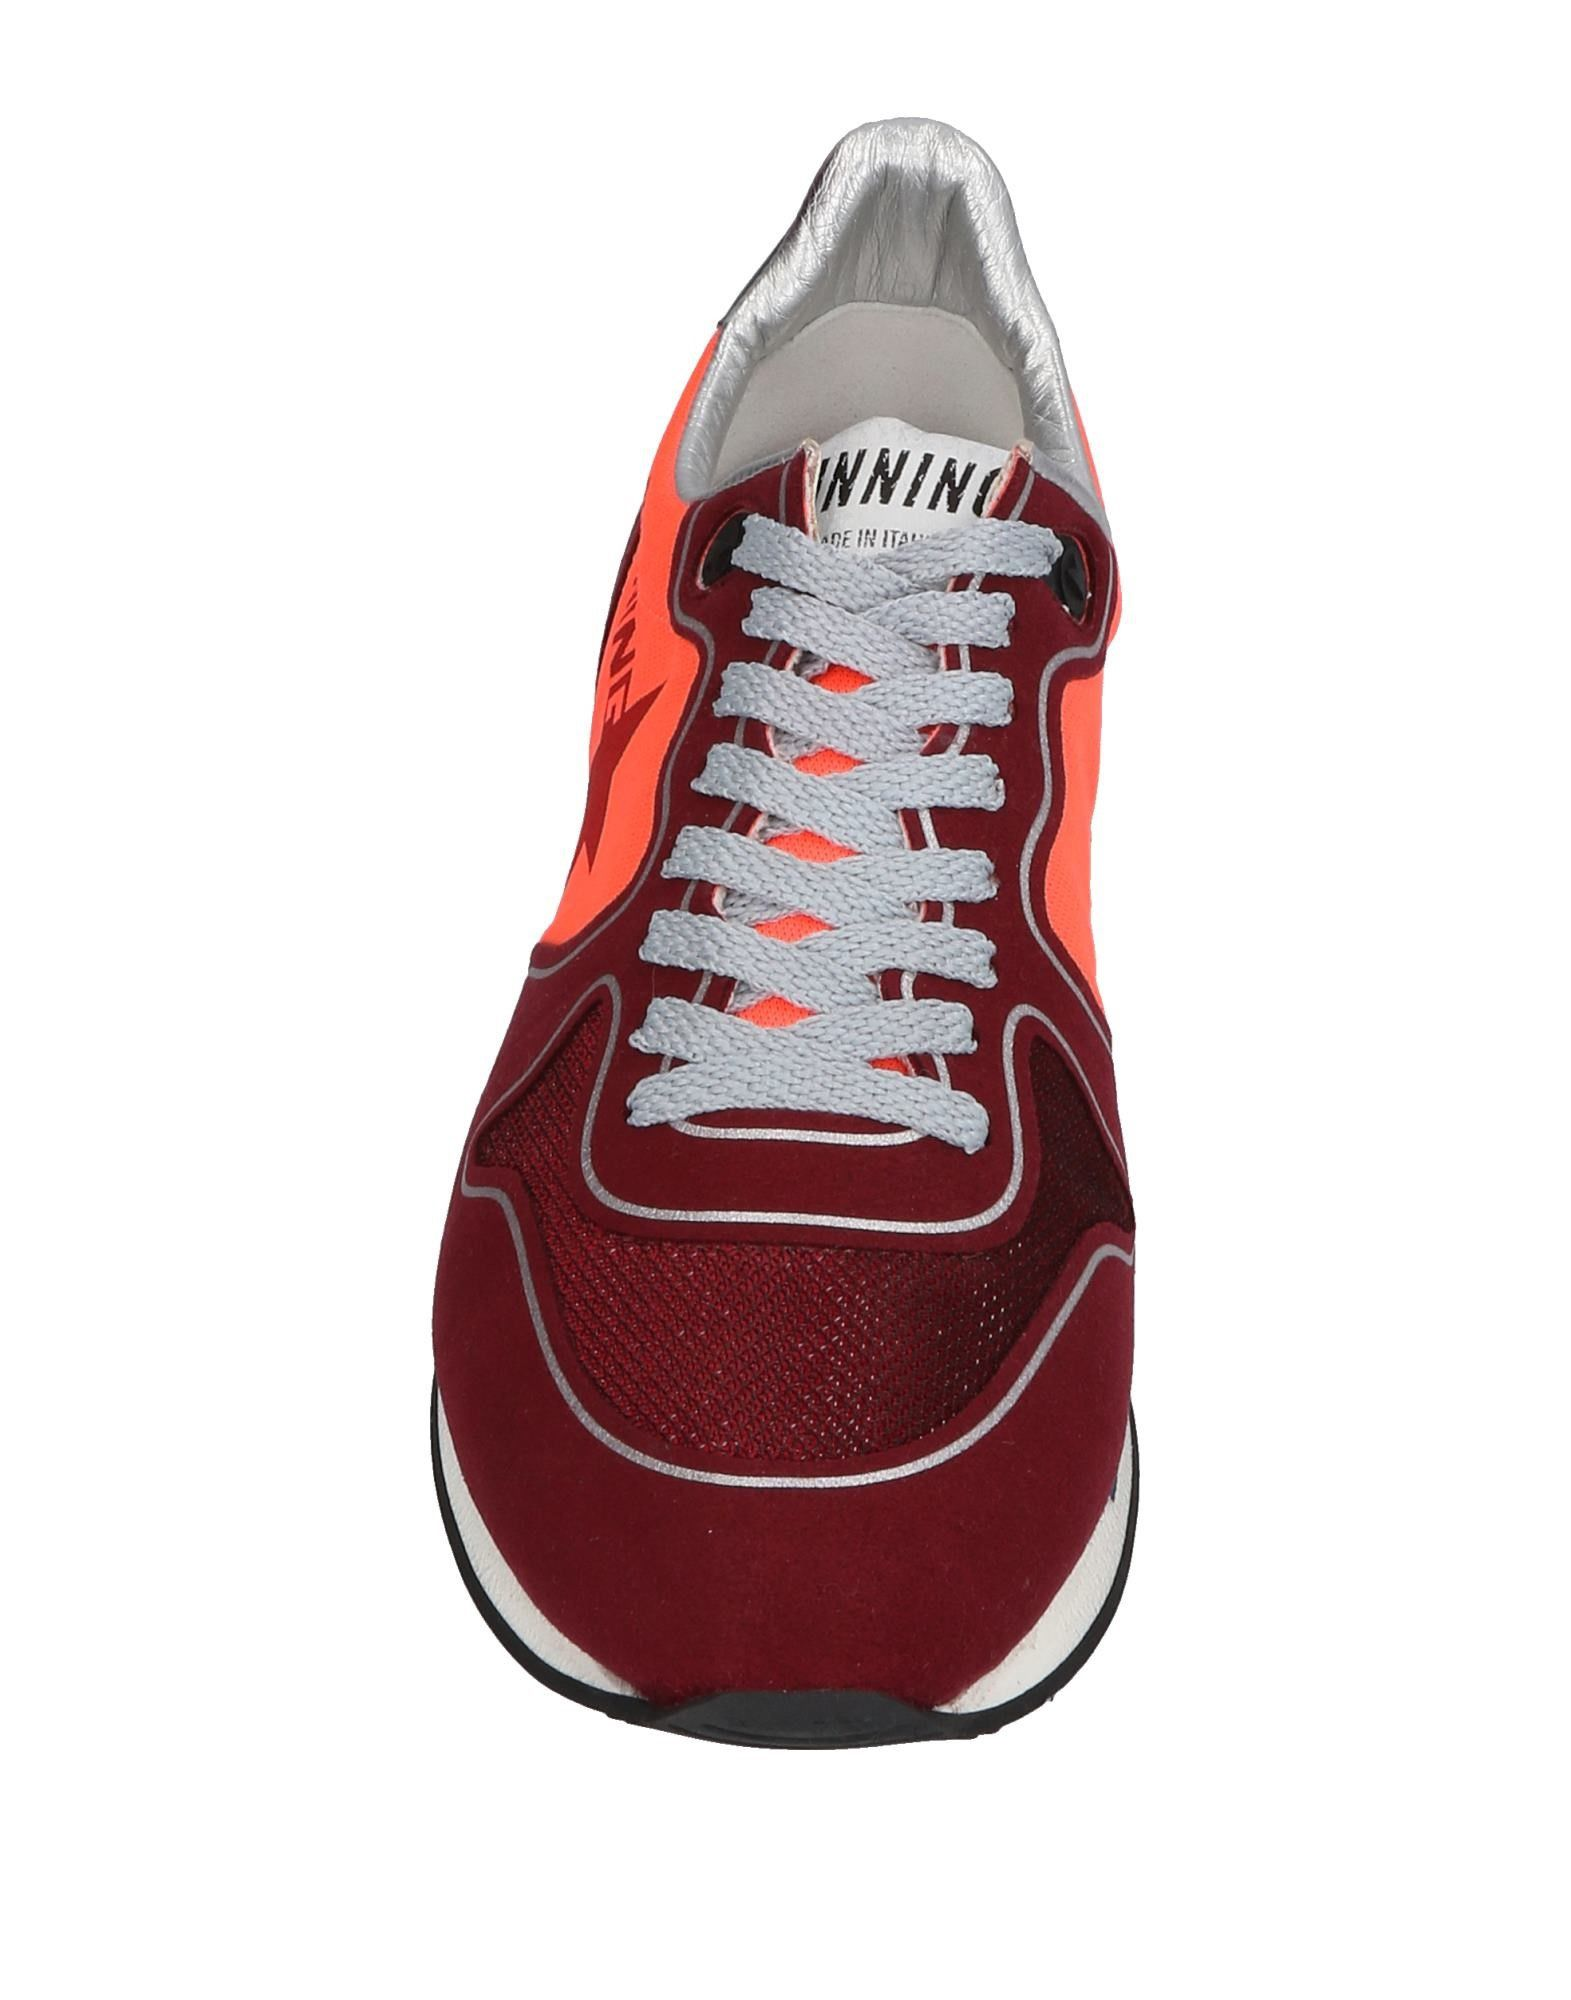 Stilvolle billige Schuhe Golden  Goose Deluxe Brand Sneakers Damen  Golden 11400070DA b11974